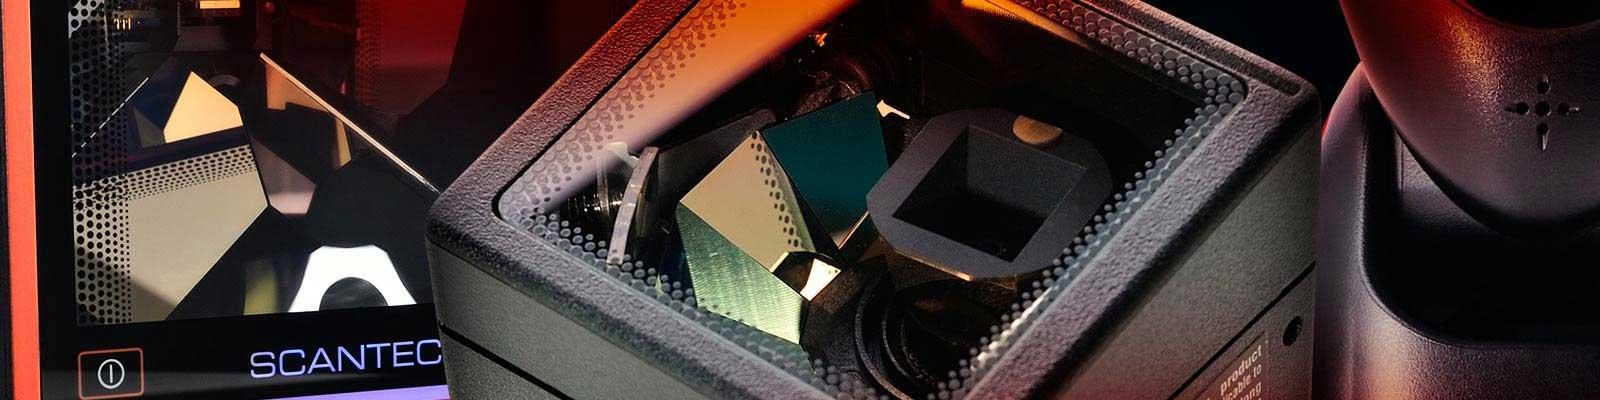 Impresoras Etiquetas Mesa Toshiba